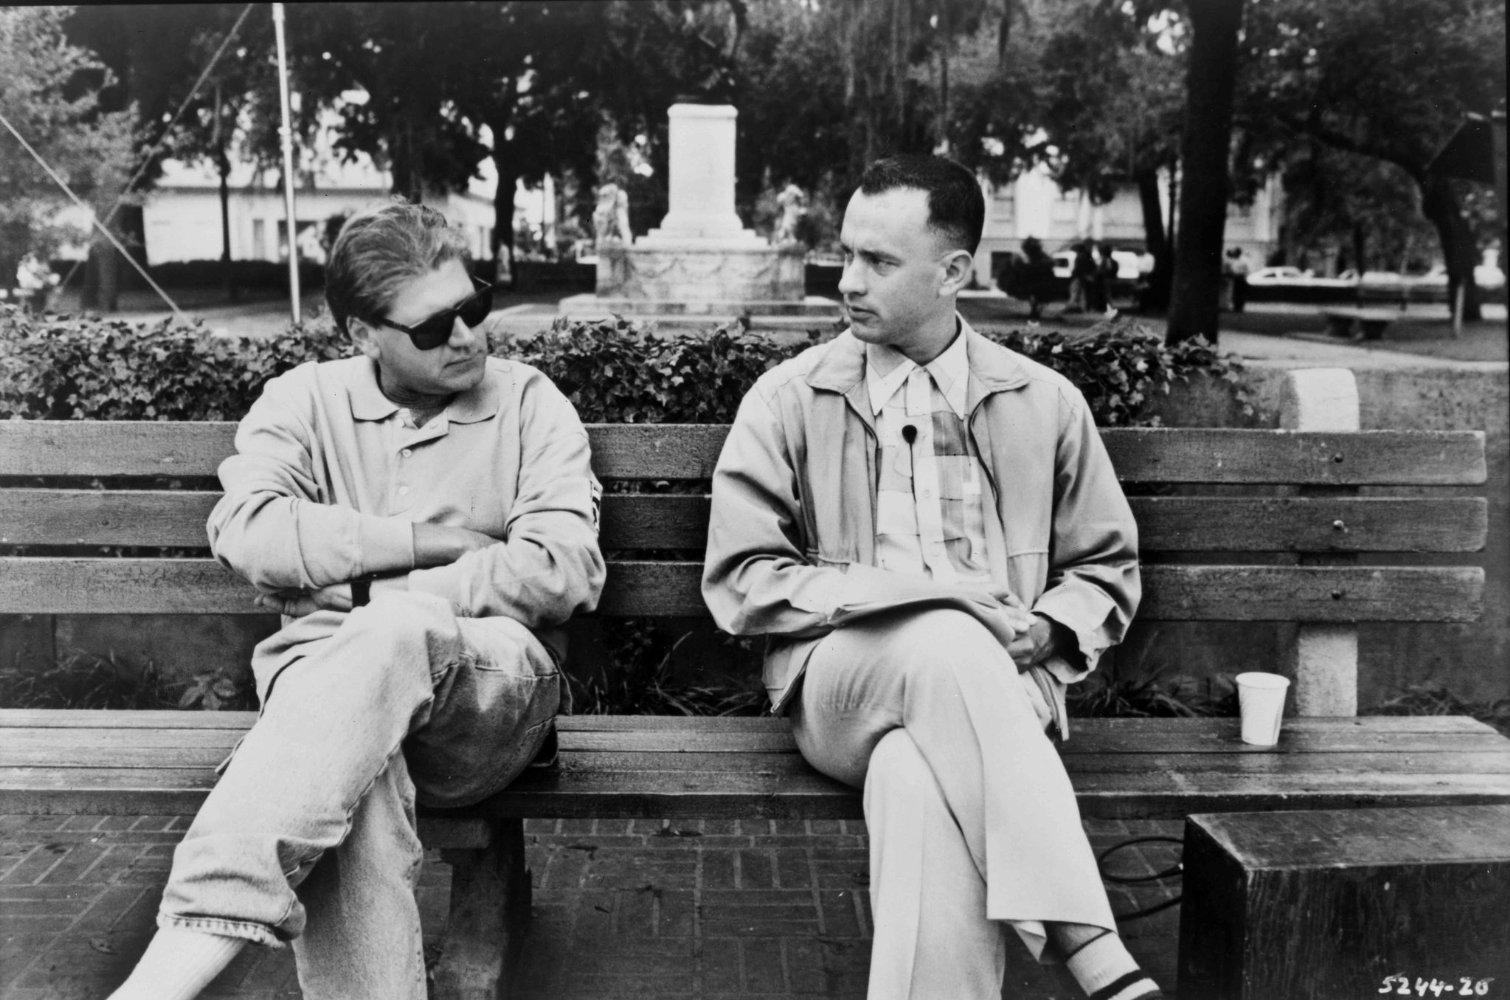 Tom Hanks و Robert Zemeckis روی نیمکتی خاطره انگیز از فیلم Forrest Gump